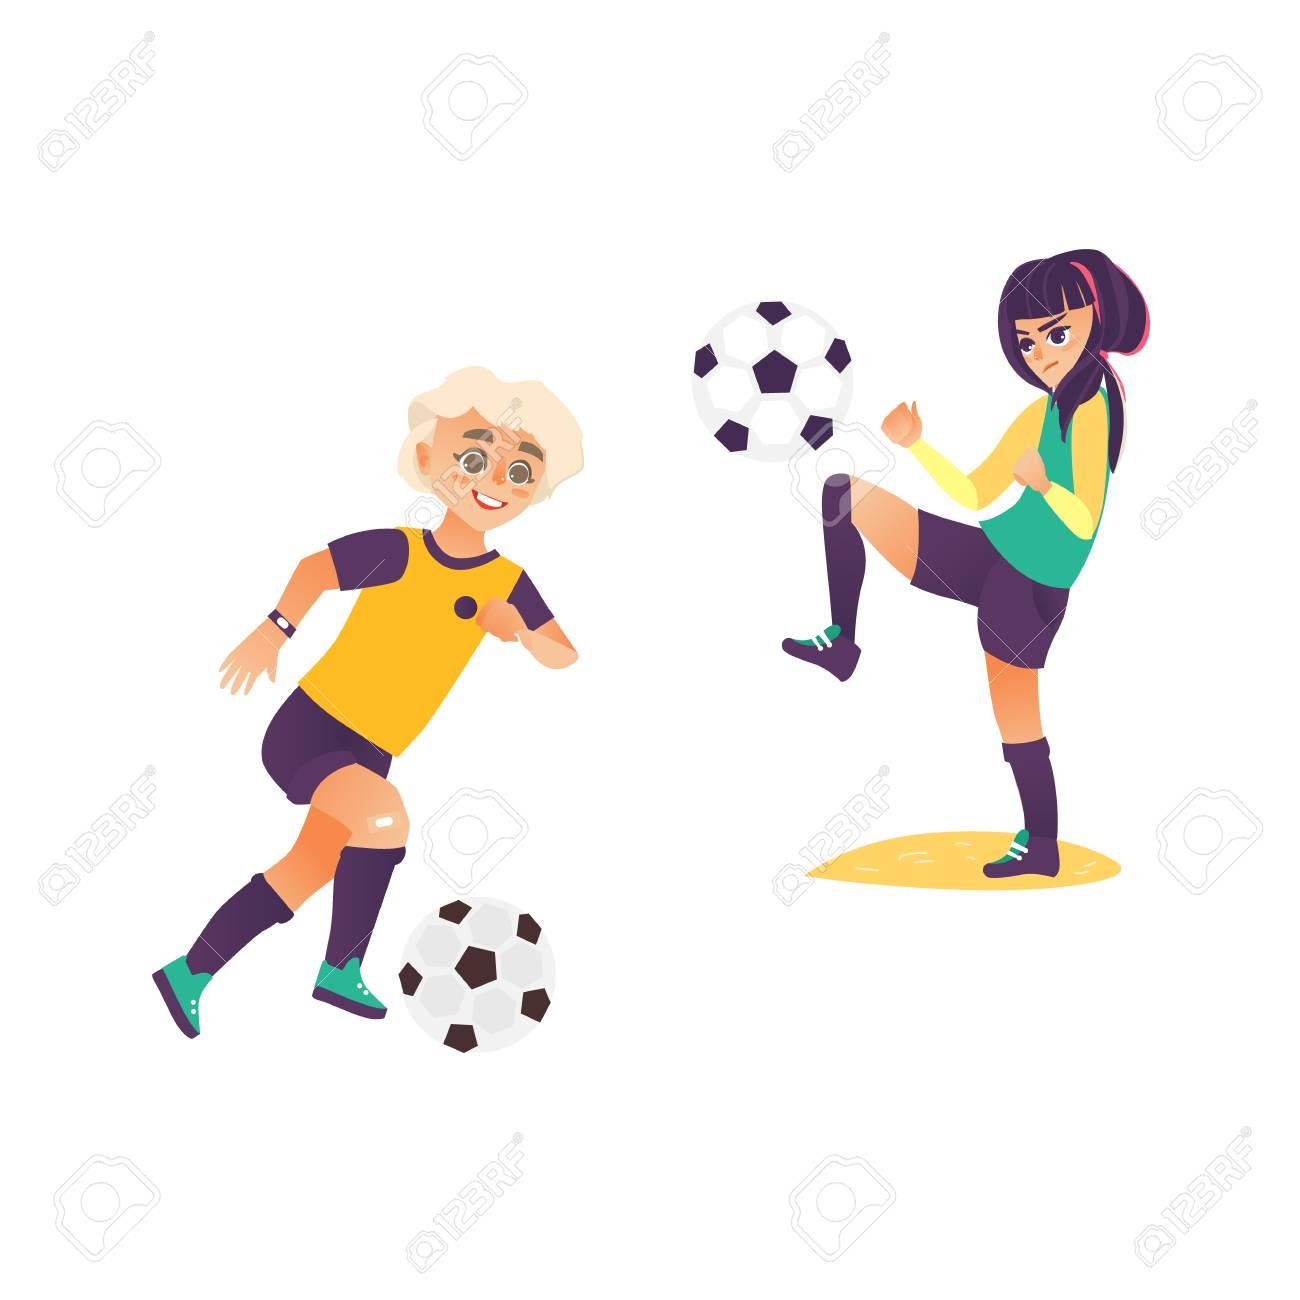 Kids Children Boy And Girl Playing Football Dribble Jiggling The Ball